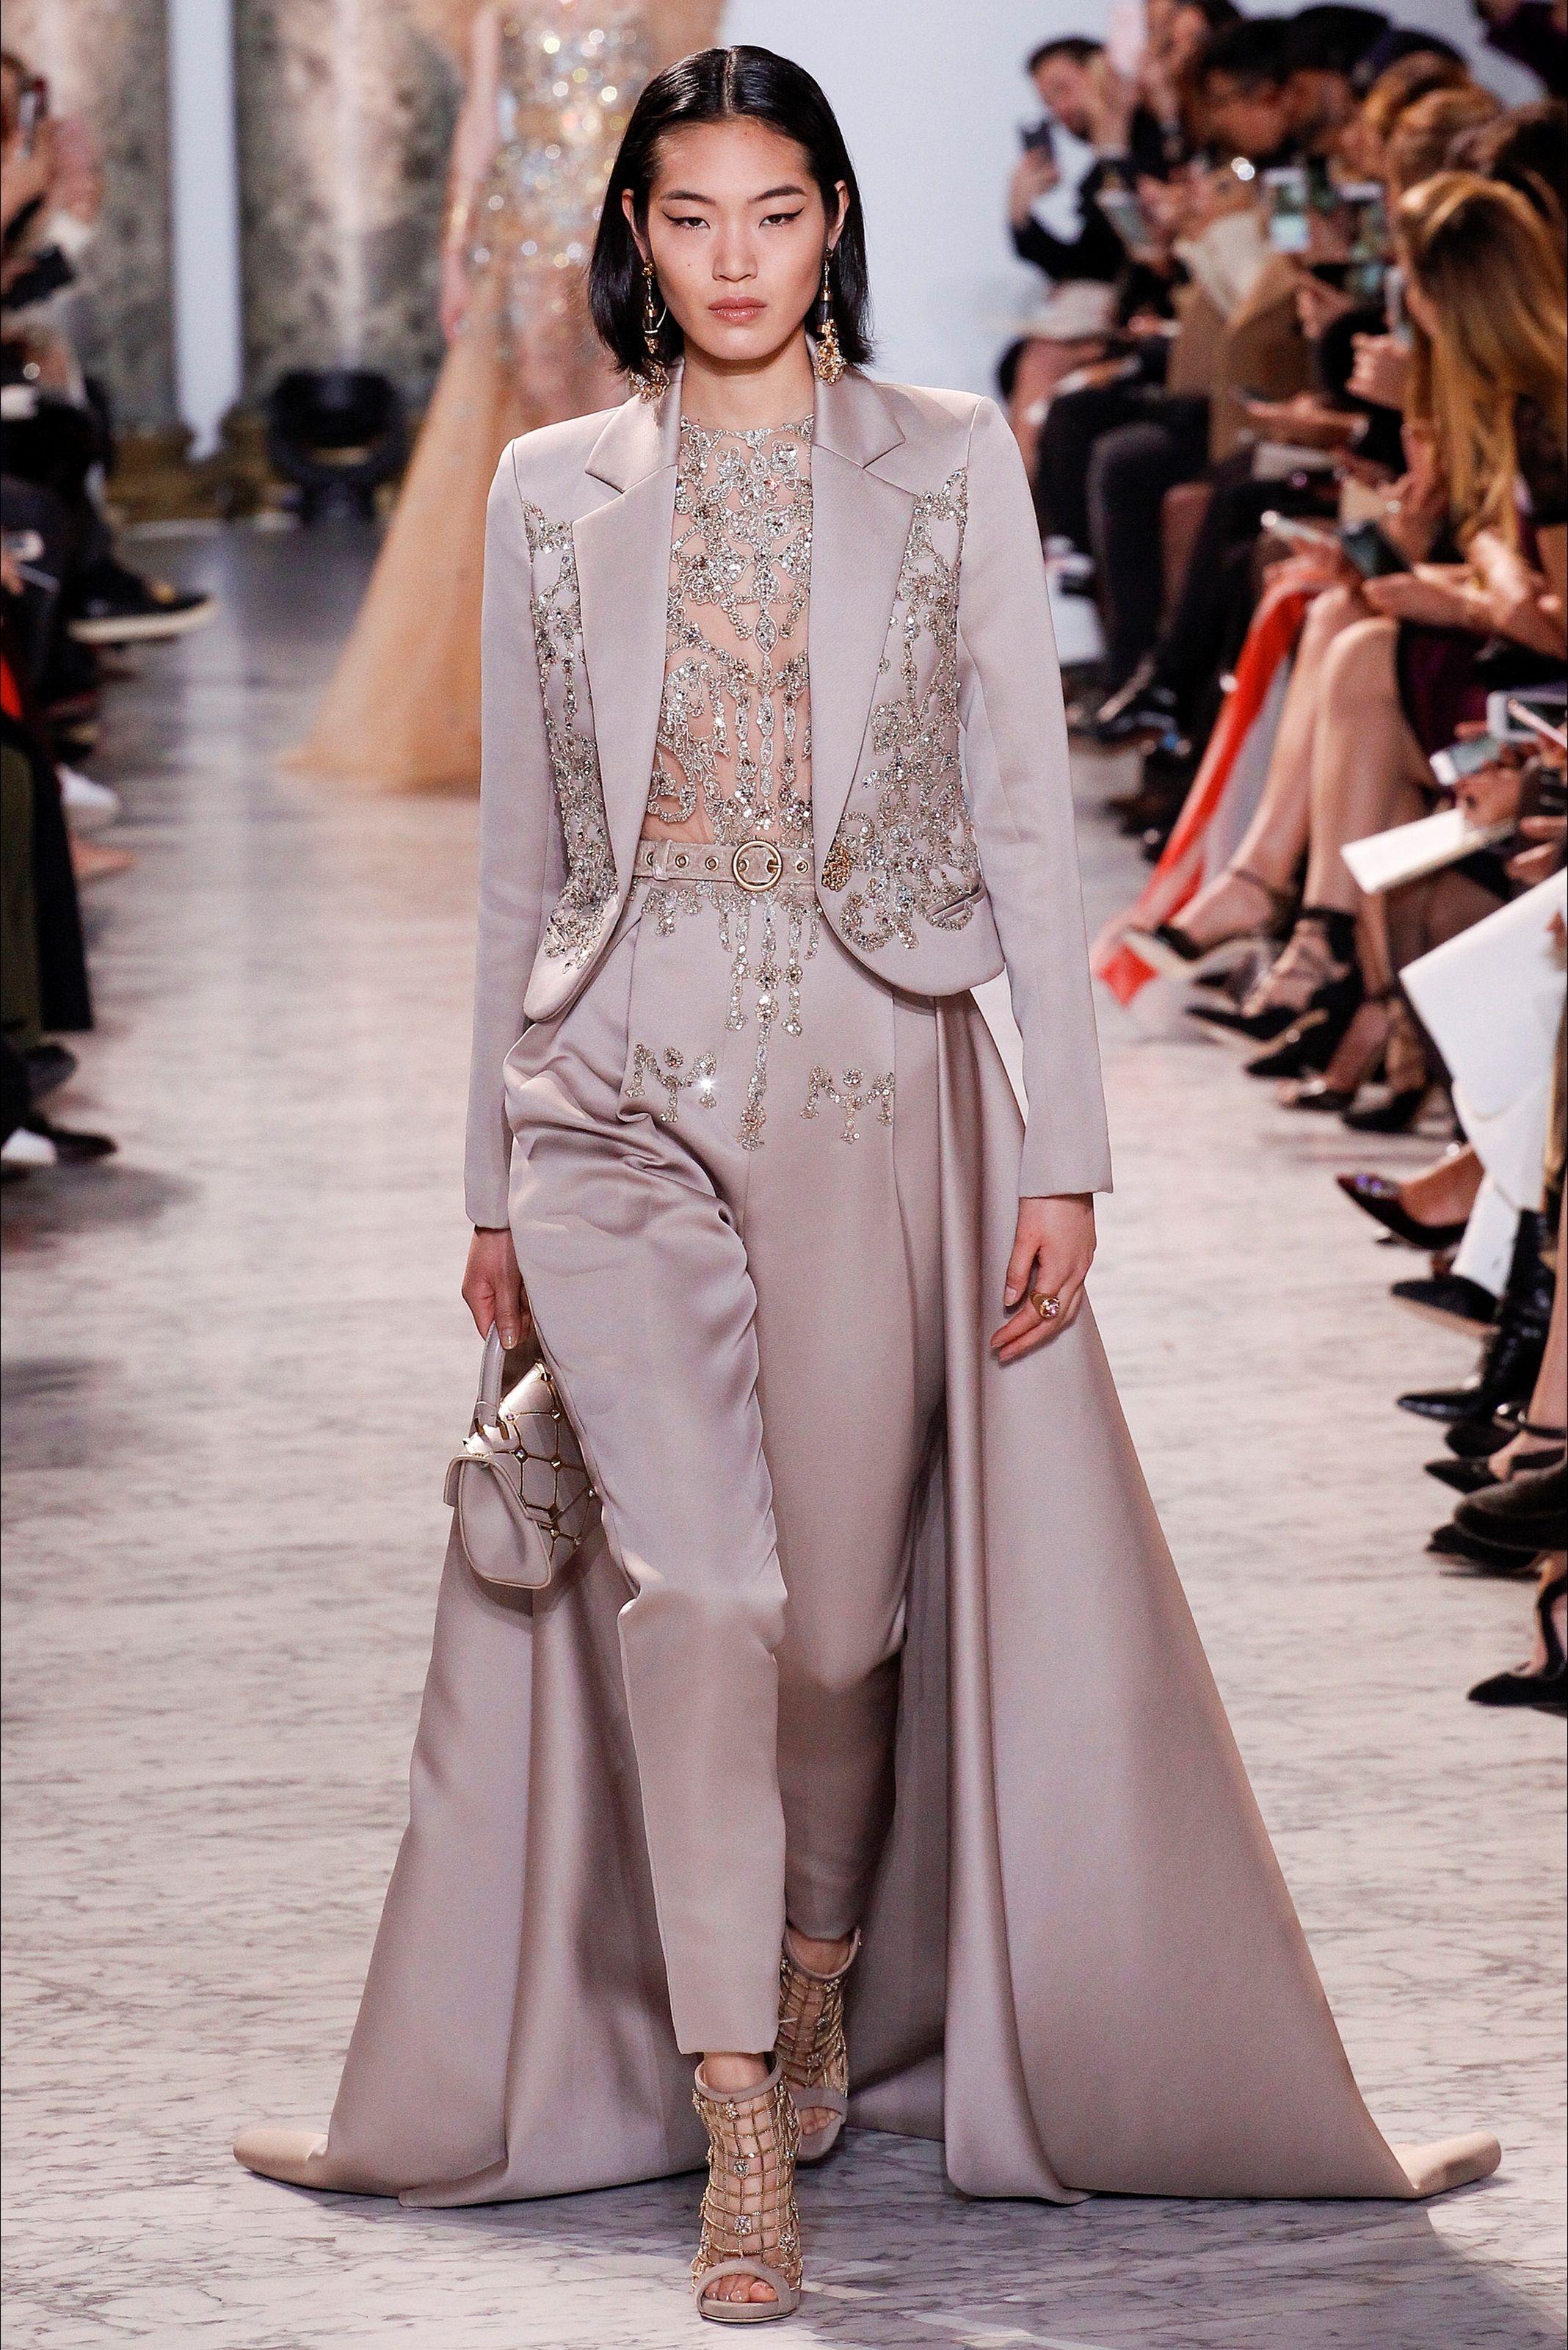 63028e090ee3 Sfilata Elie Saab Parigi - Alta Moda Primavera Estate 2017 - Vogue ...